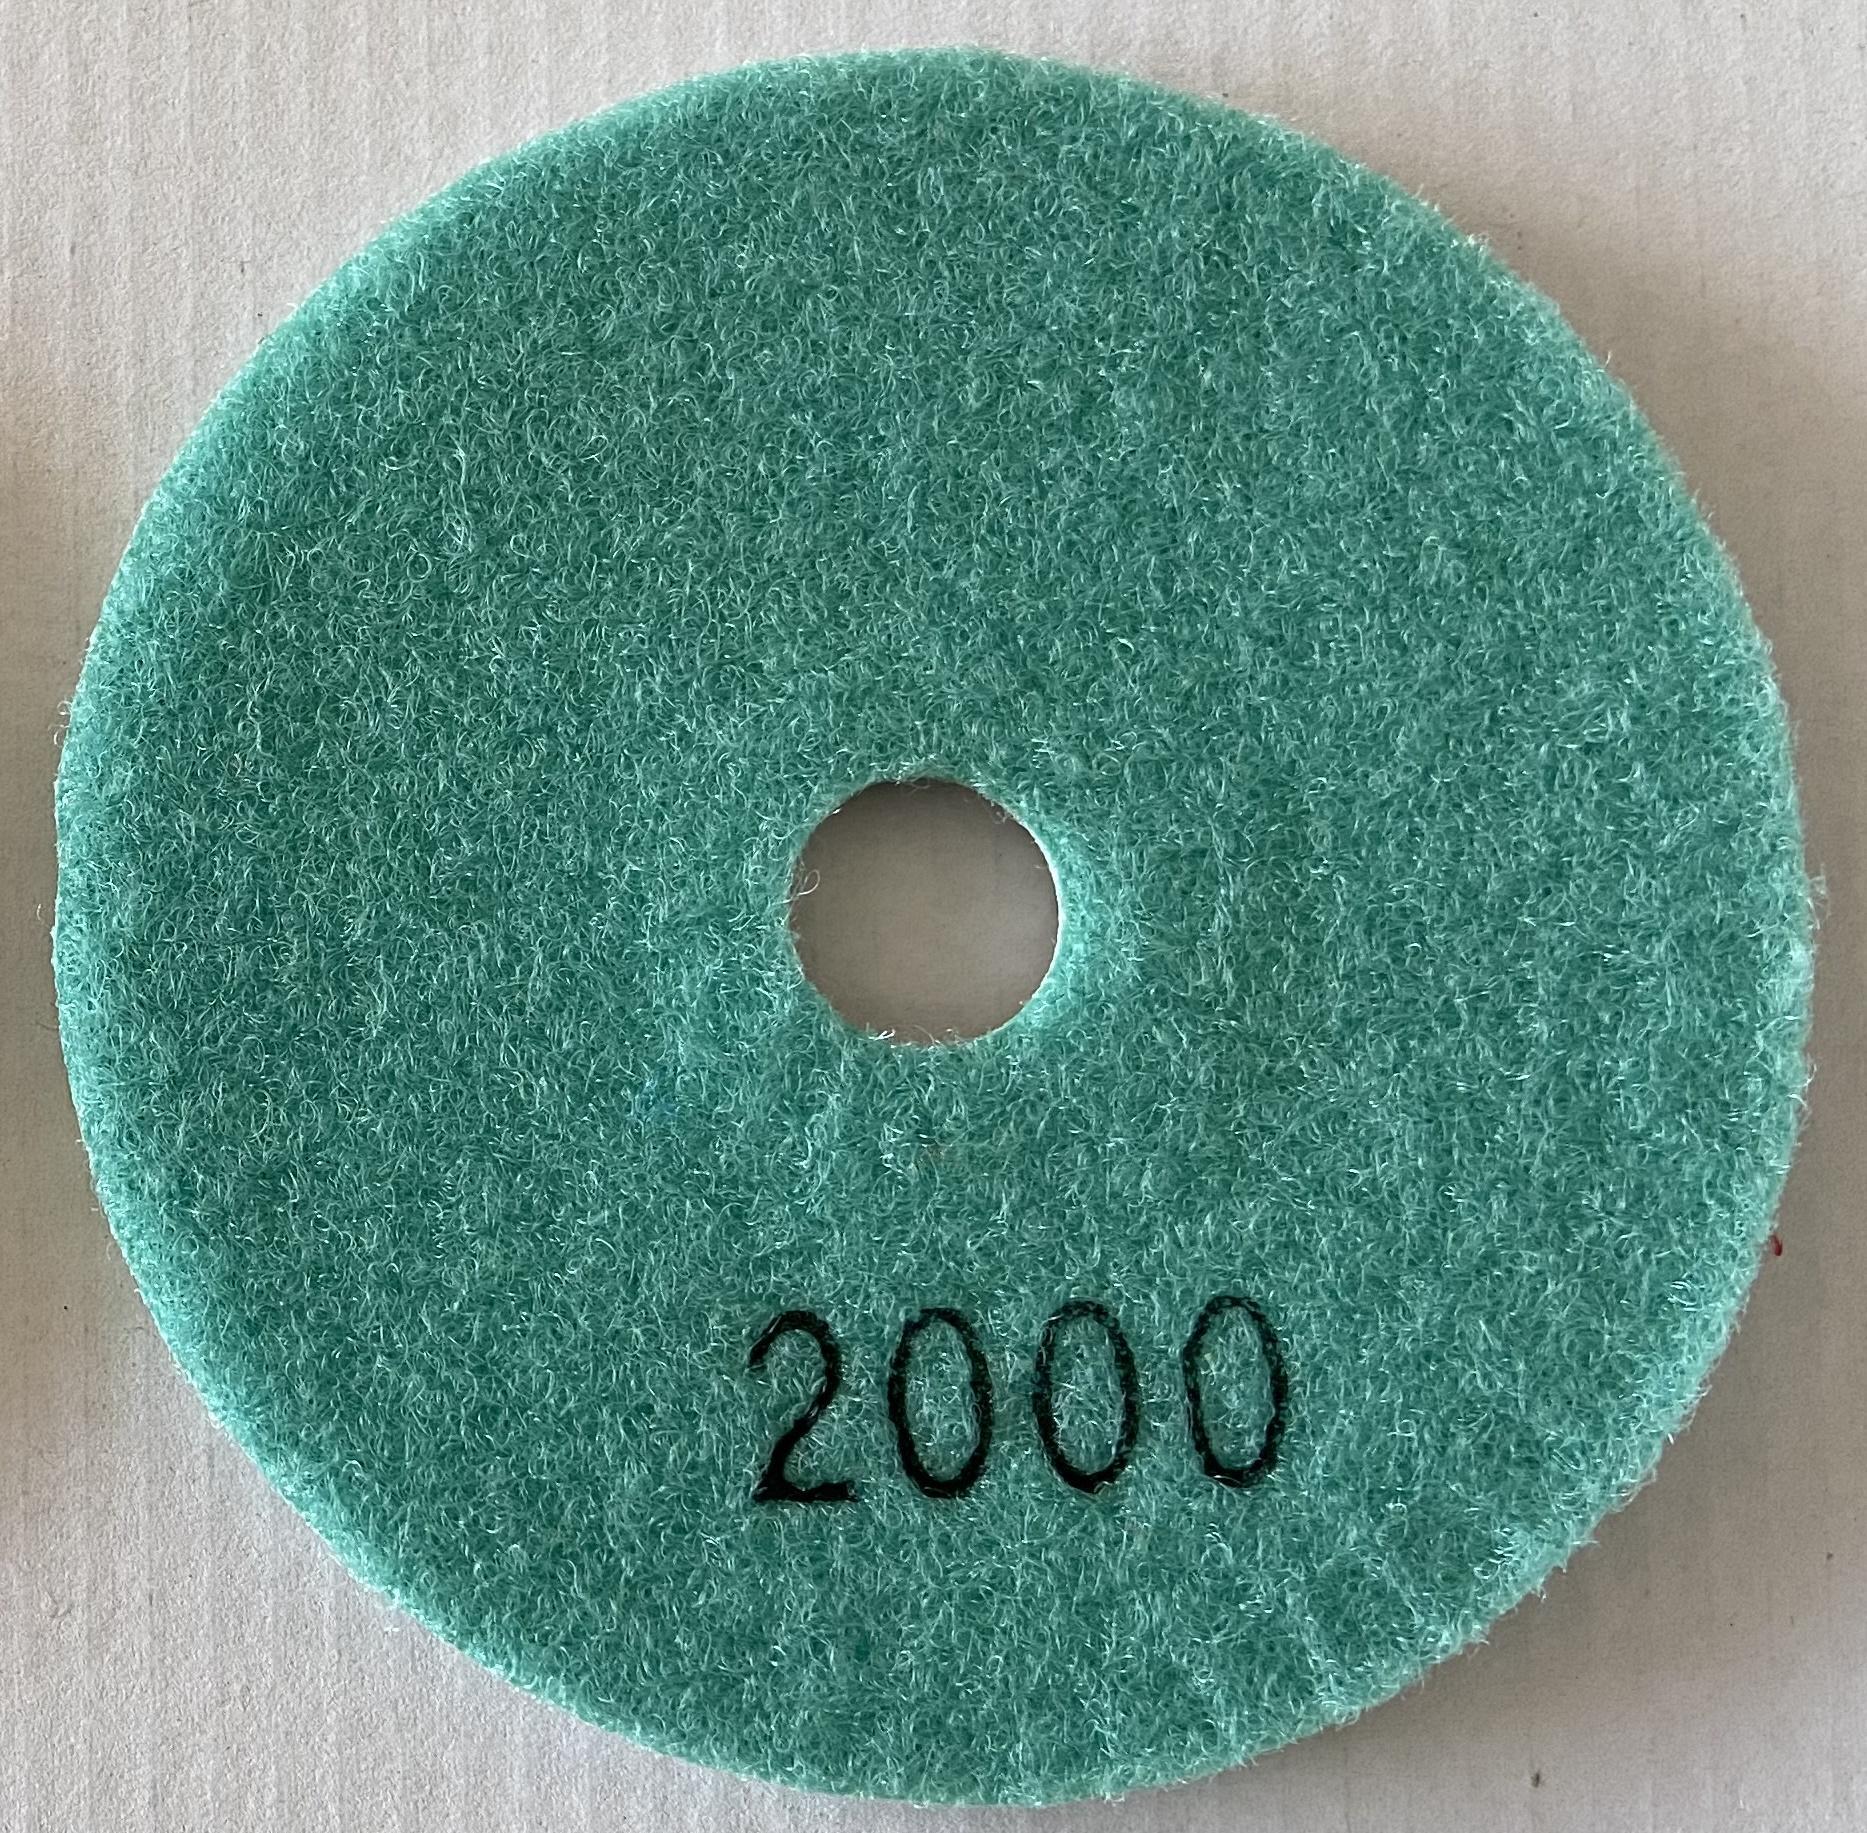 Pad 2001